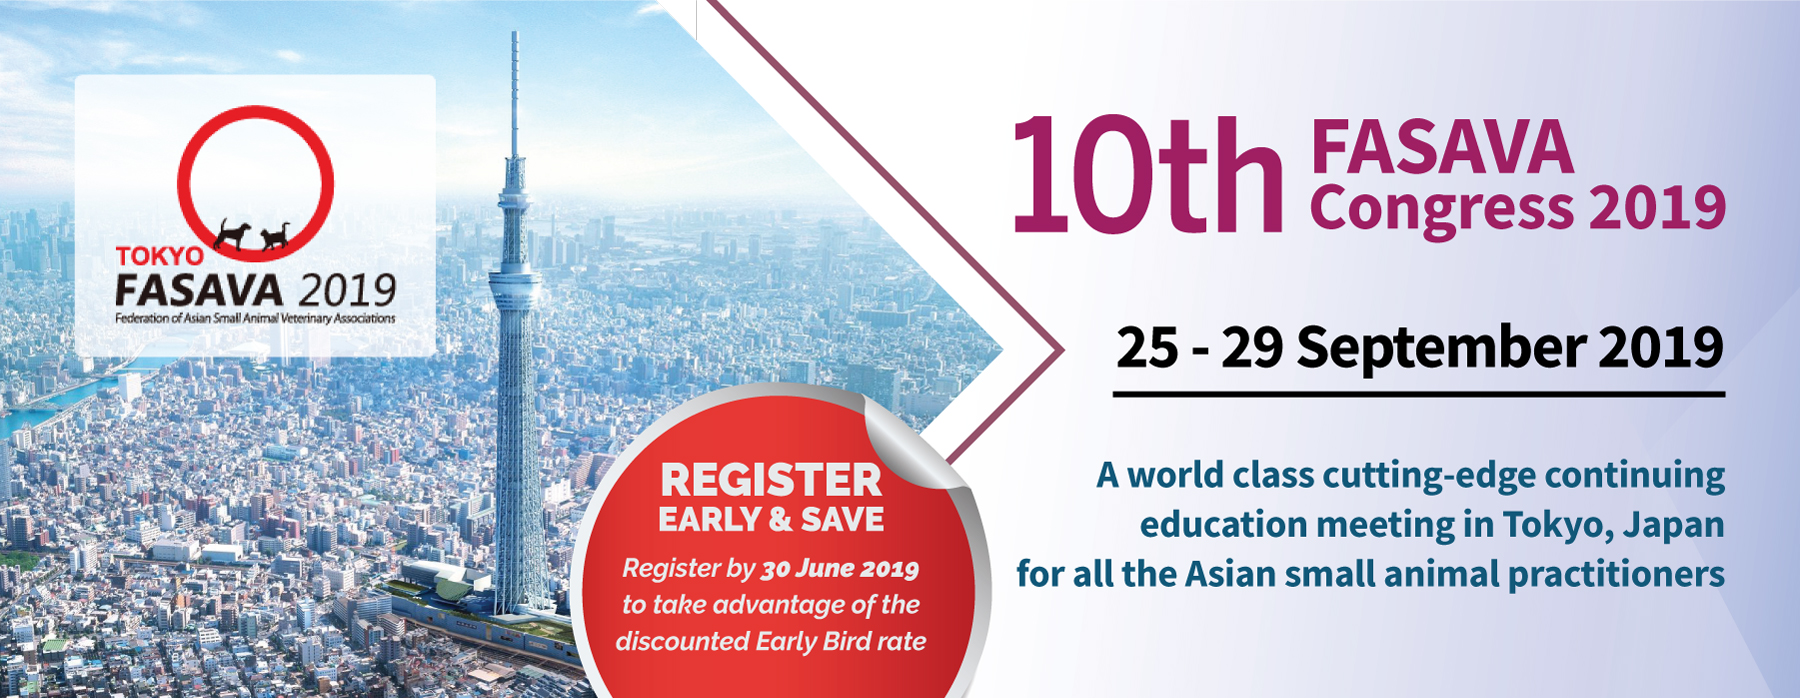 10th FASAVA Congress 2019